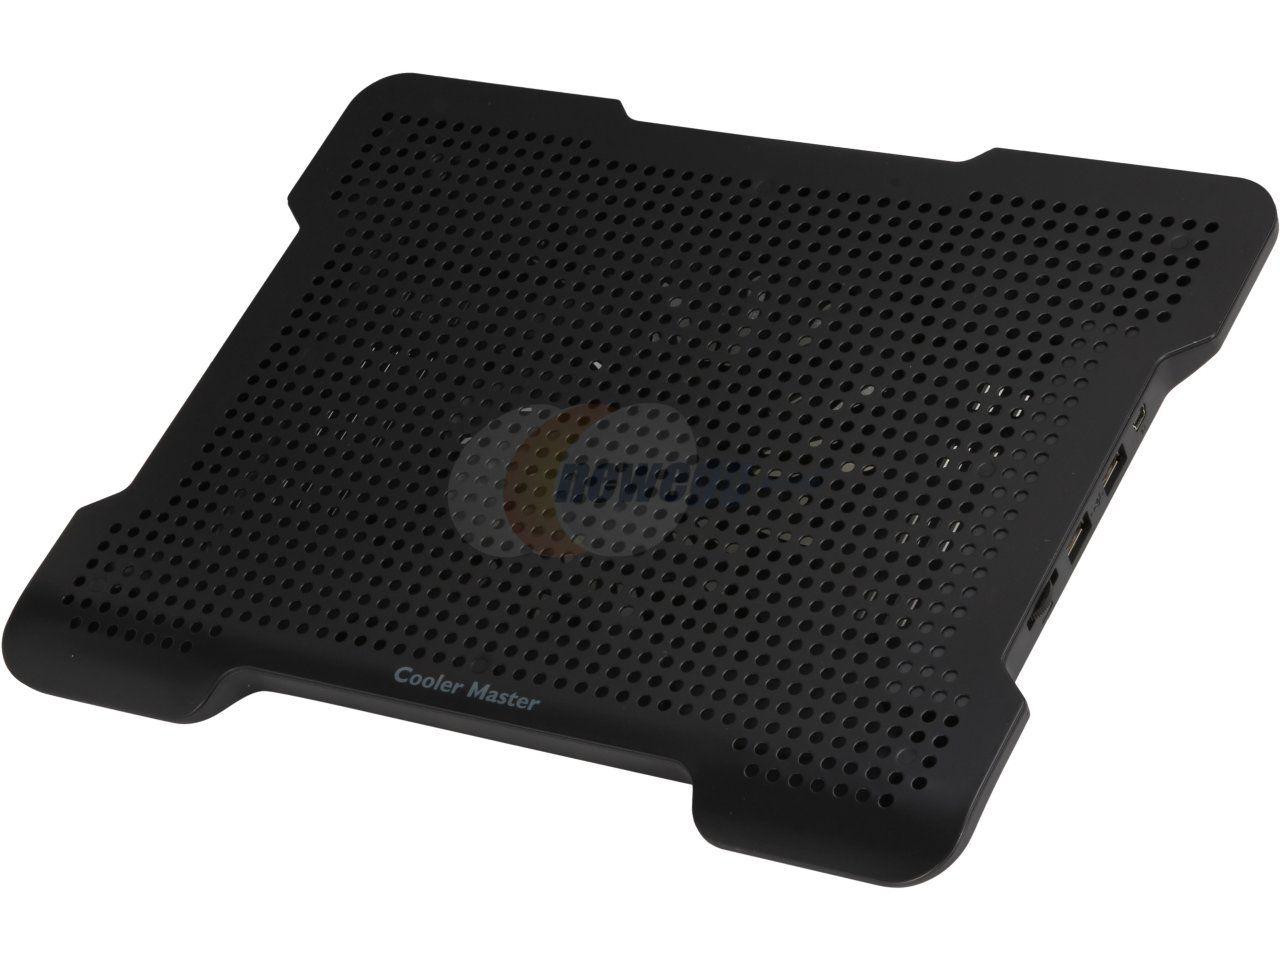 Cooler Master Notepal X Slim Ultra Slim Laptop Cooling Pad With 160 Mm Fan Laptop Cooling Pad Cooler Master Pad